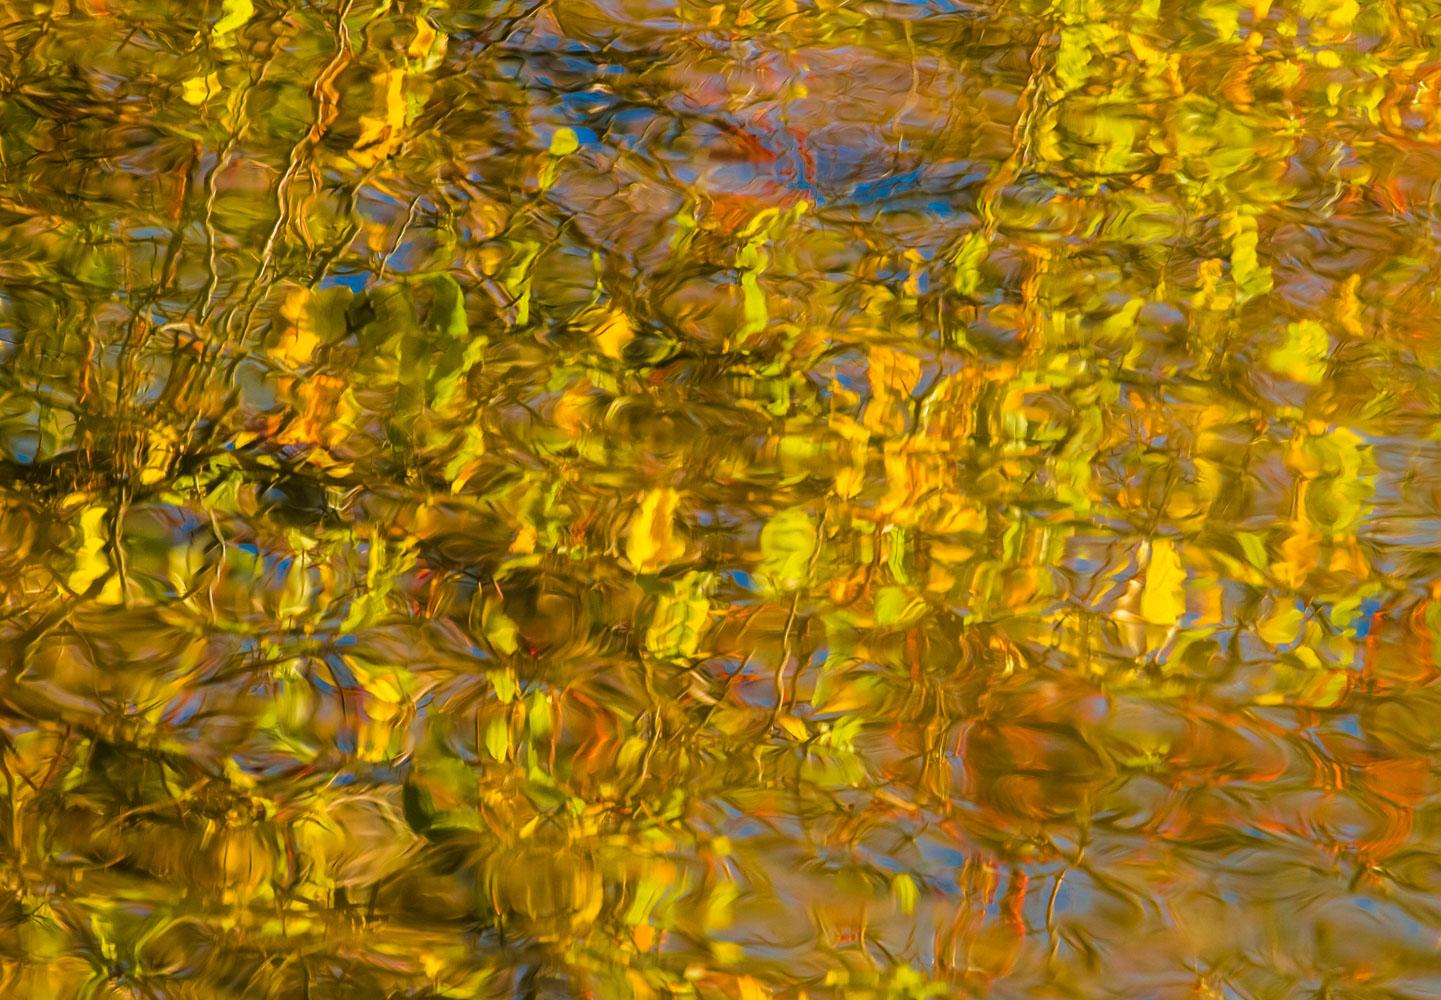 Liquid Light: Golden Radiance No. 1